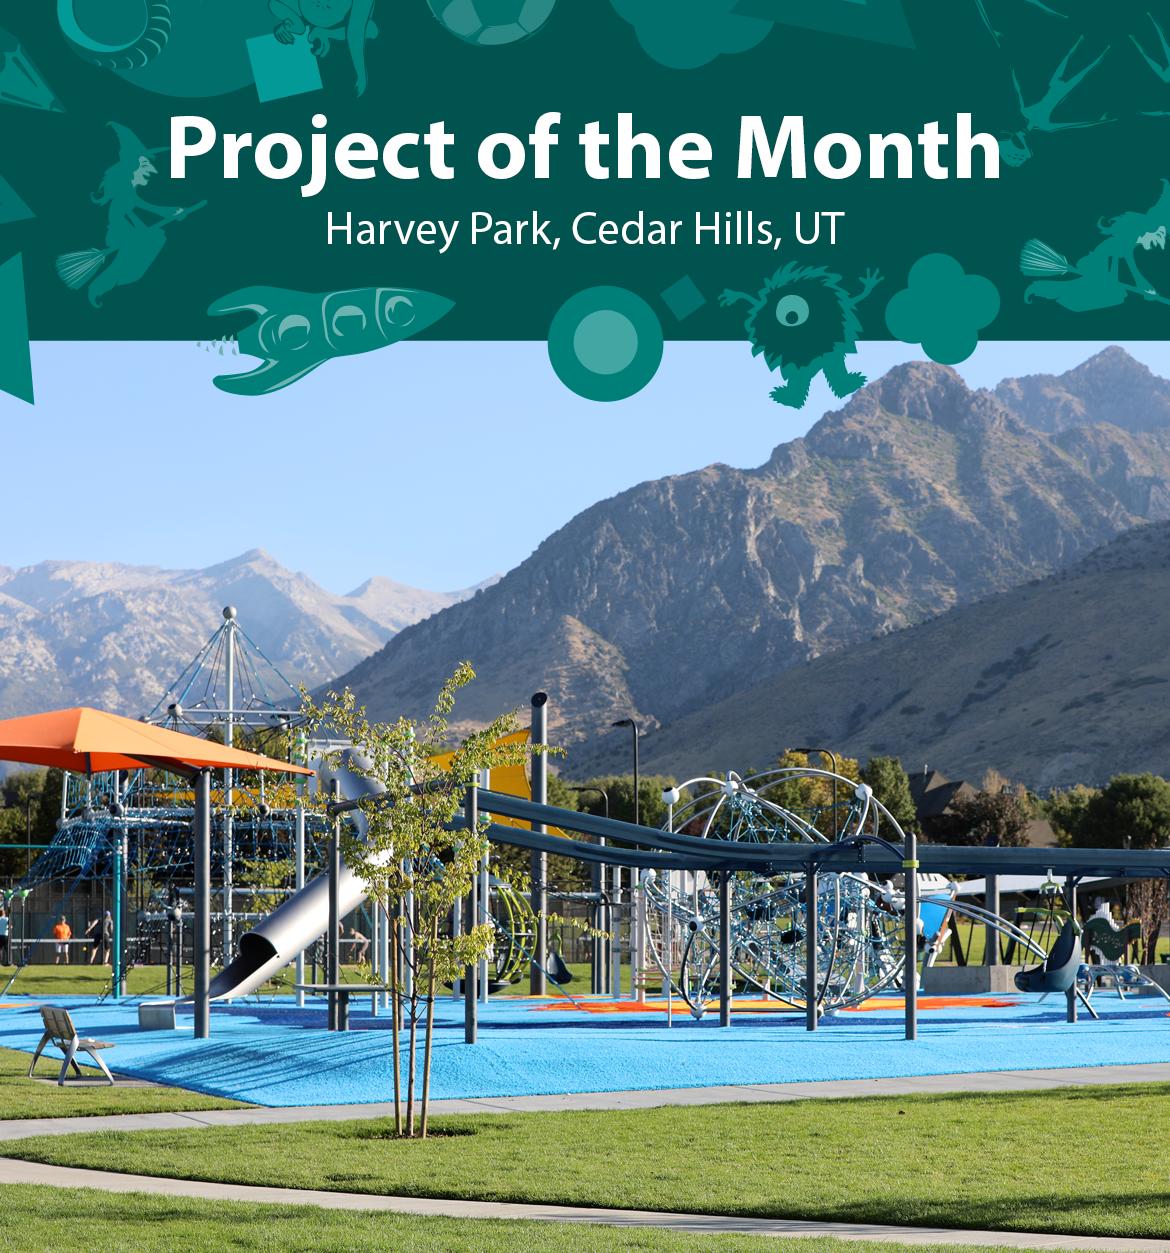 Harvey Park, Cedar Hills, UT